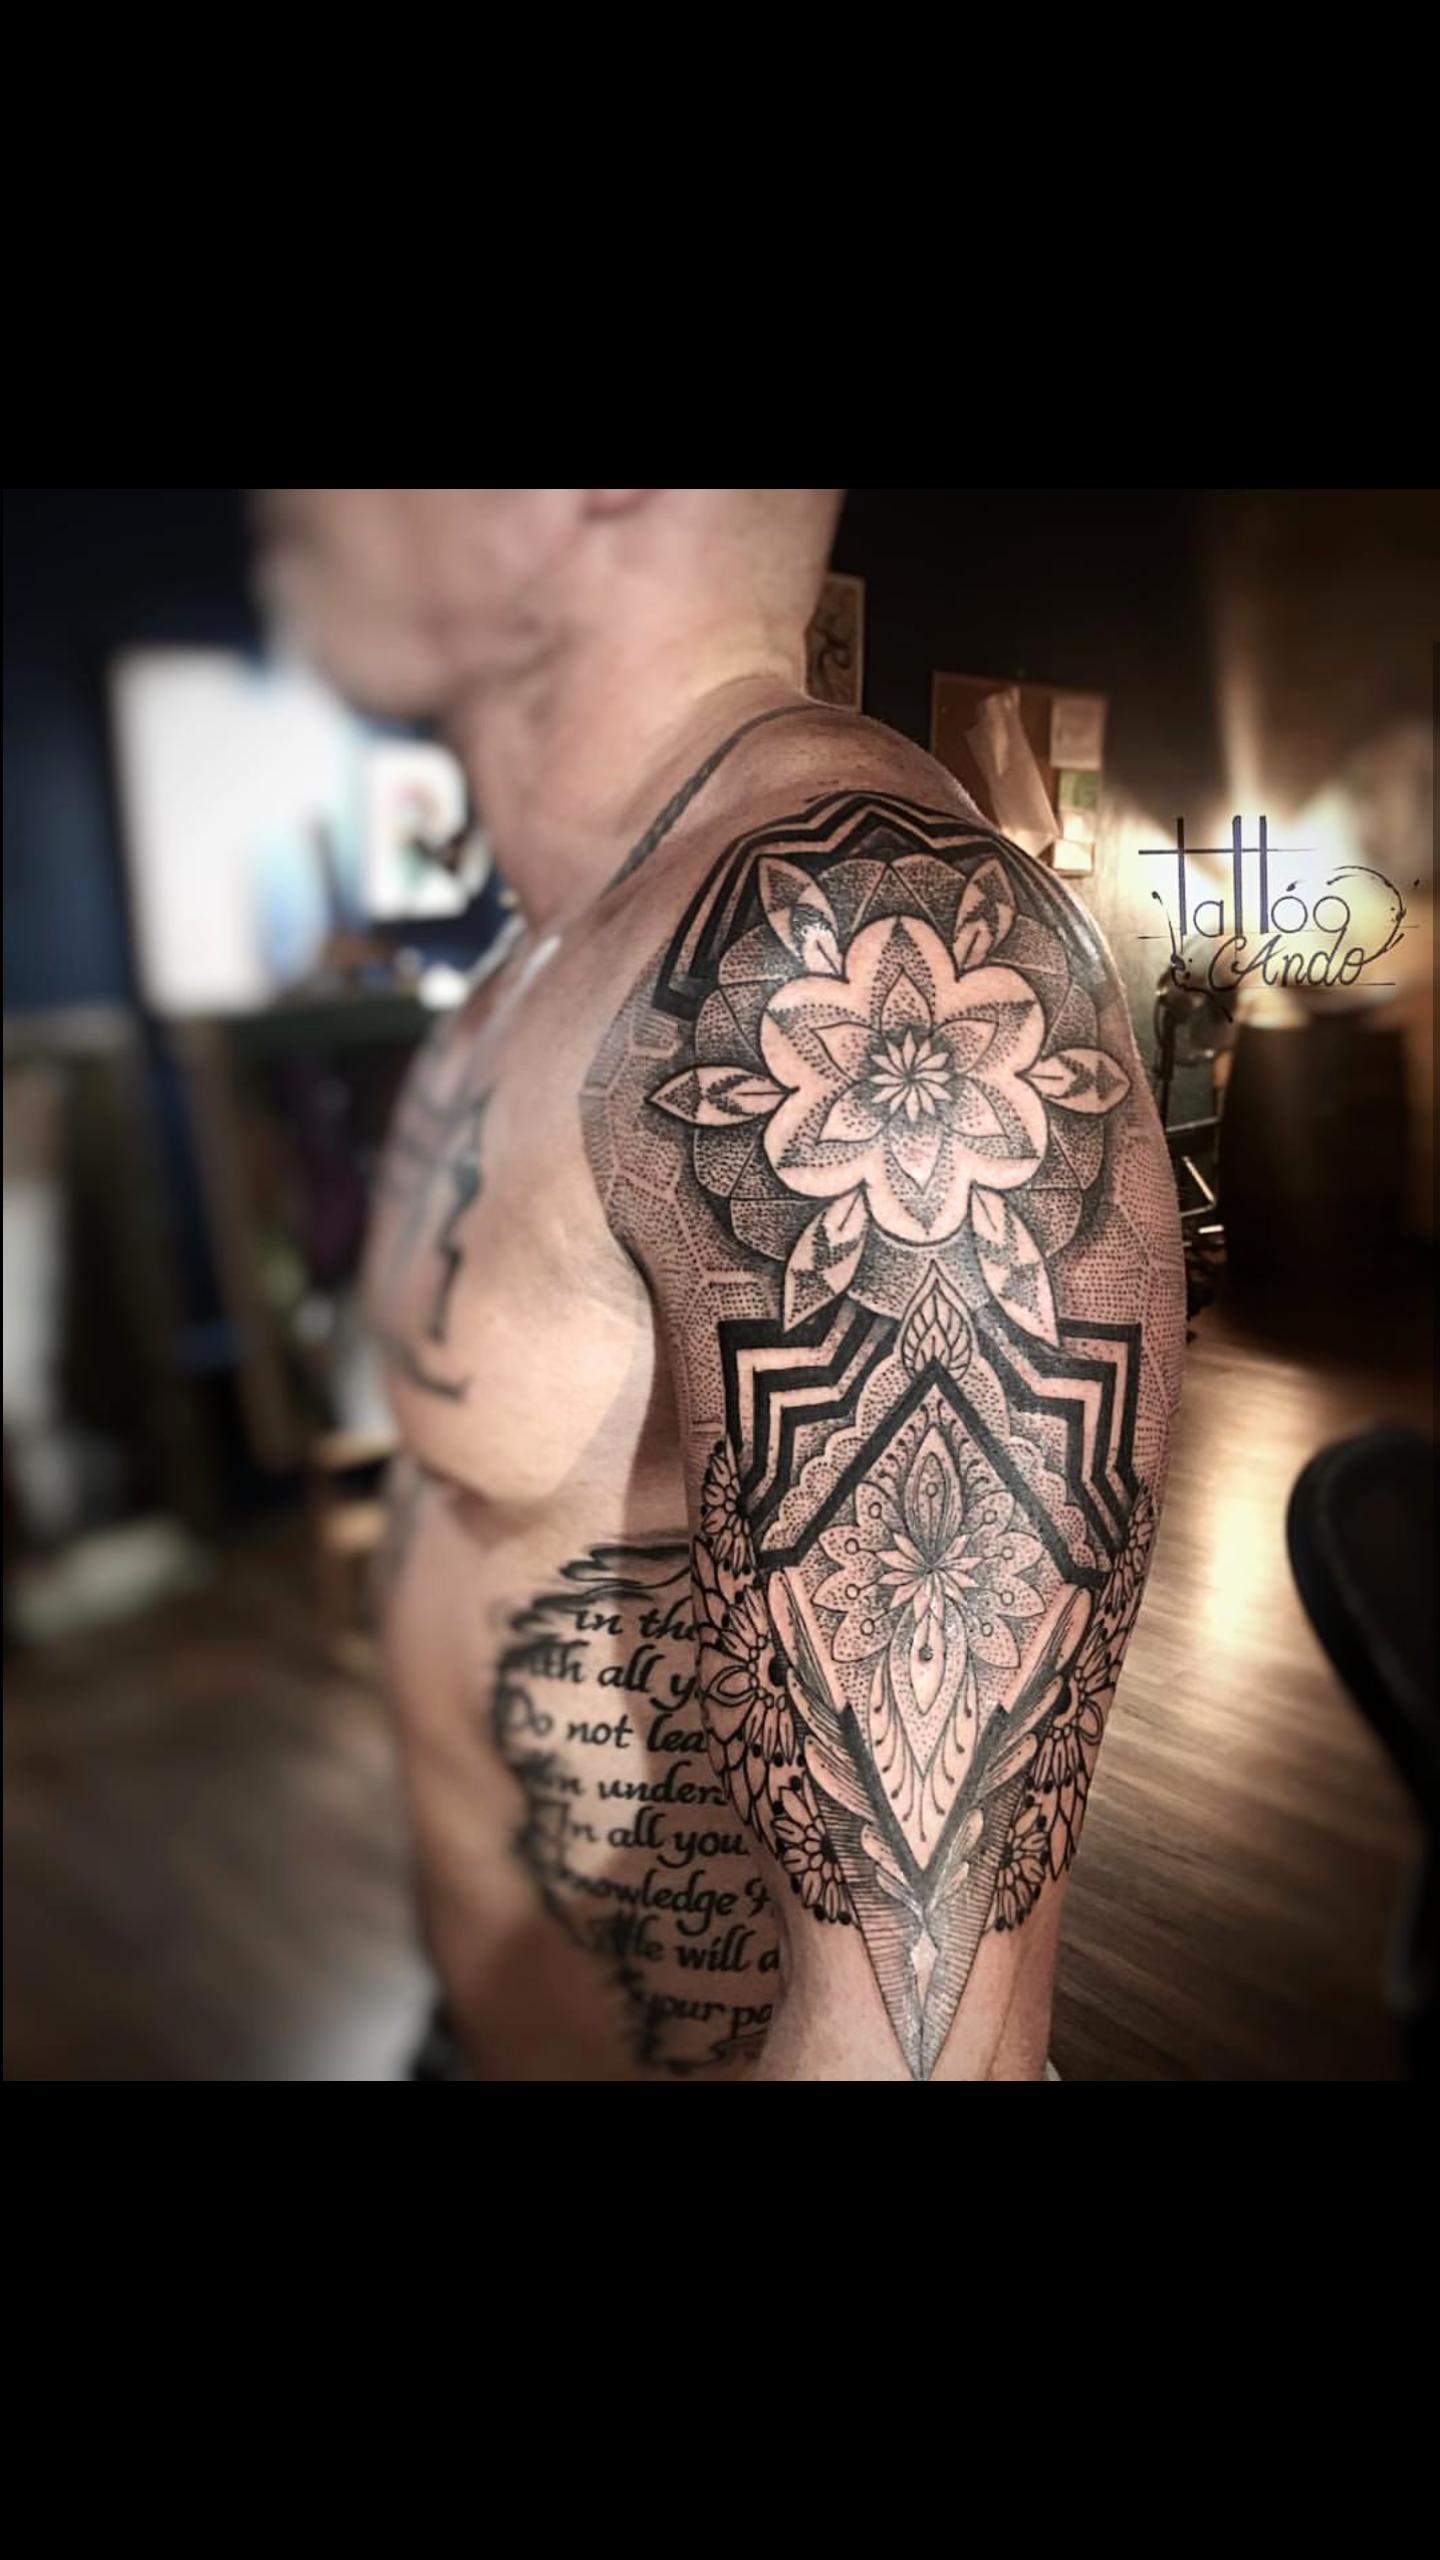 Geometry Tattoo Blackwork Tattoo Blackwork Tattoo Best Tattoo Shops Geometry Tattoo